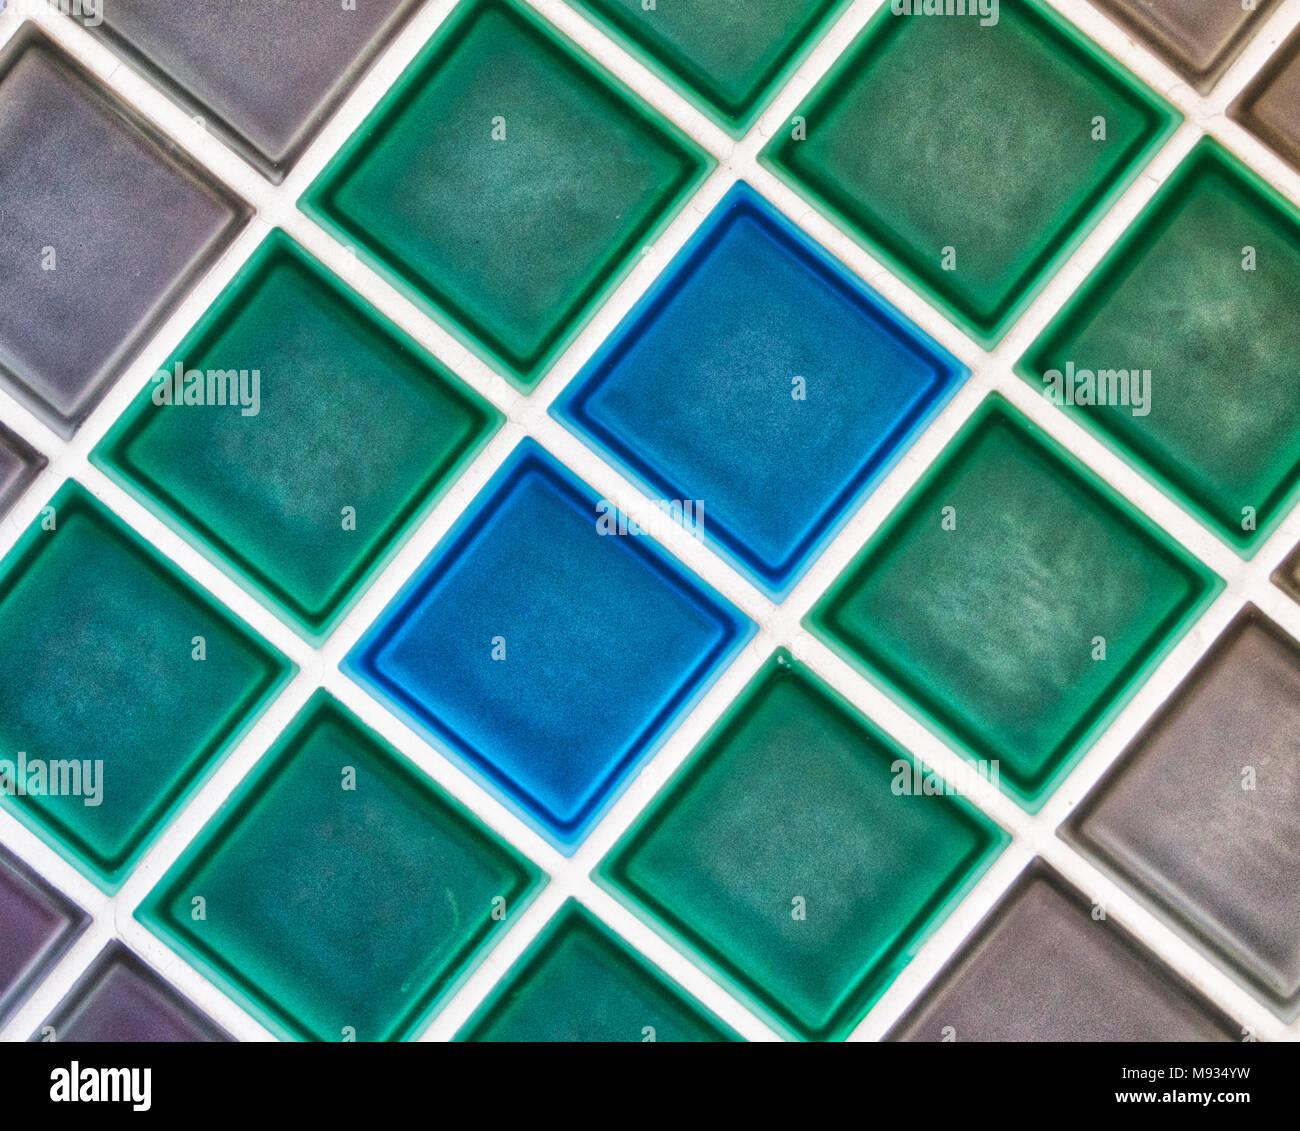 Madrid Spanien 21 Marz 2018 Bunte Keramik Fliesen Mosaik Grau